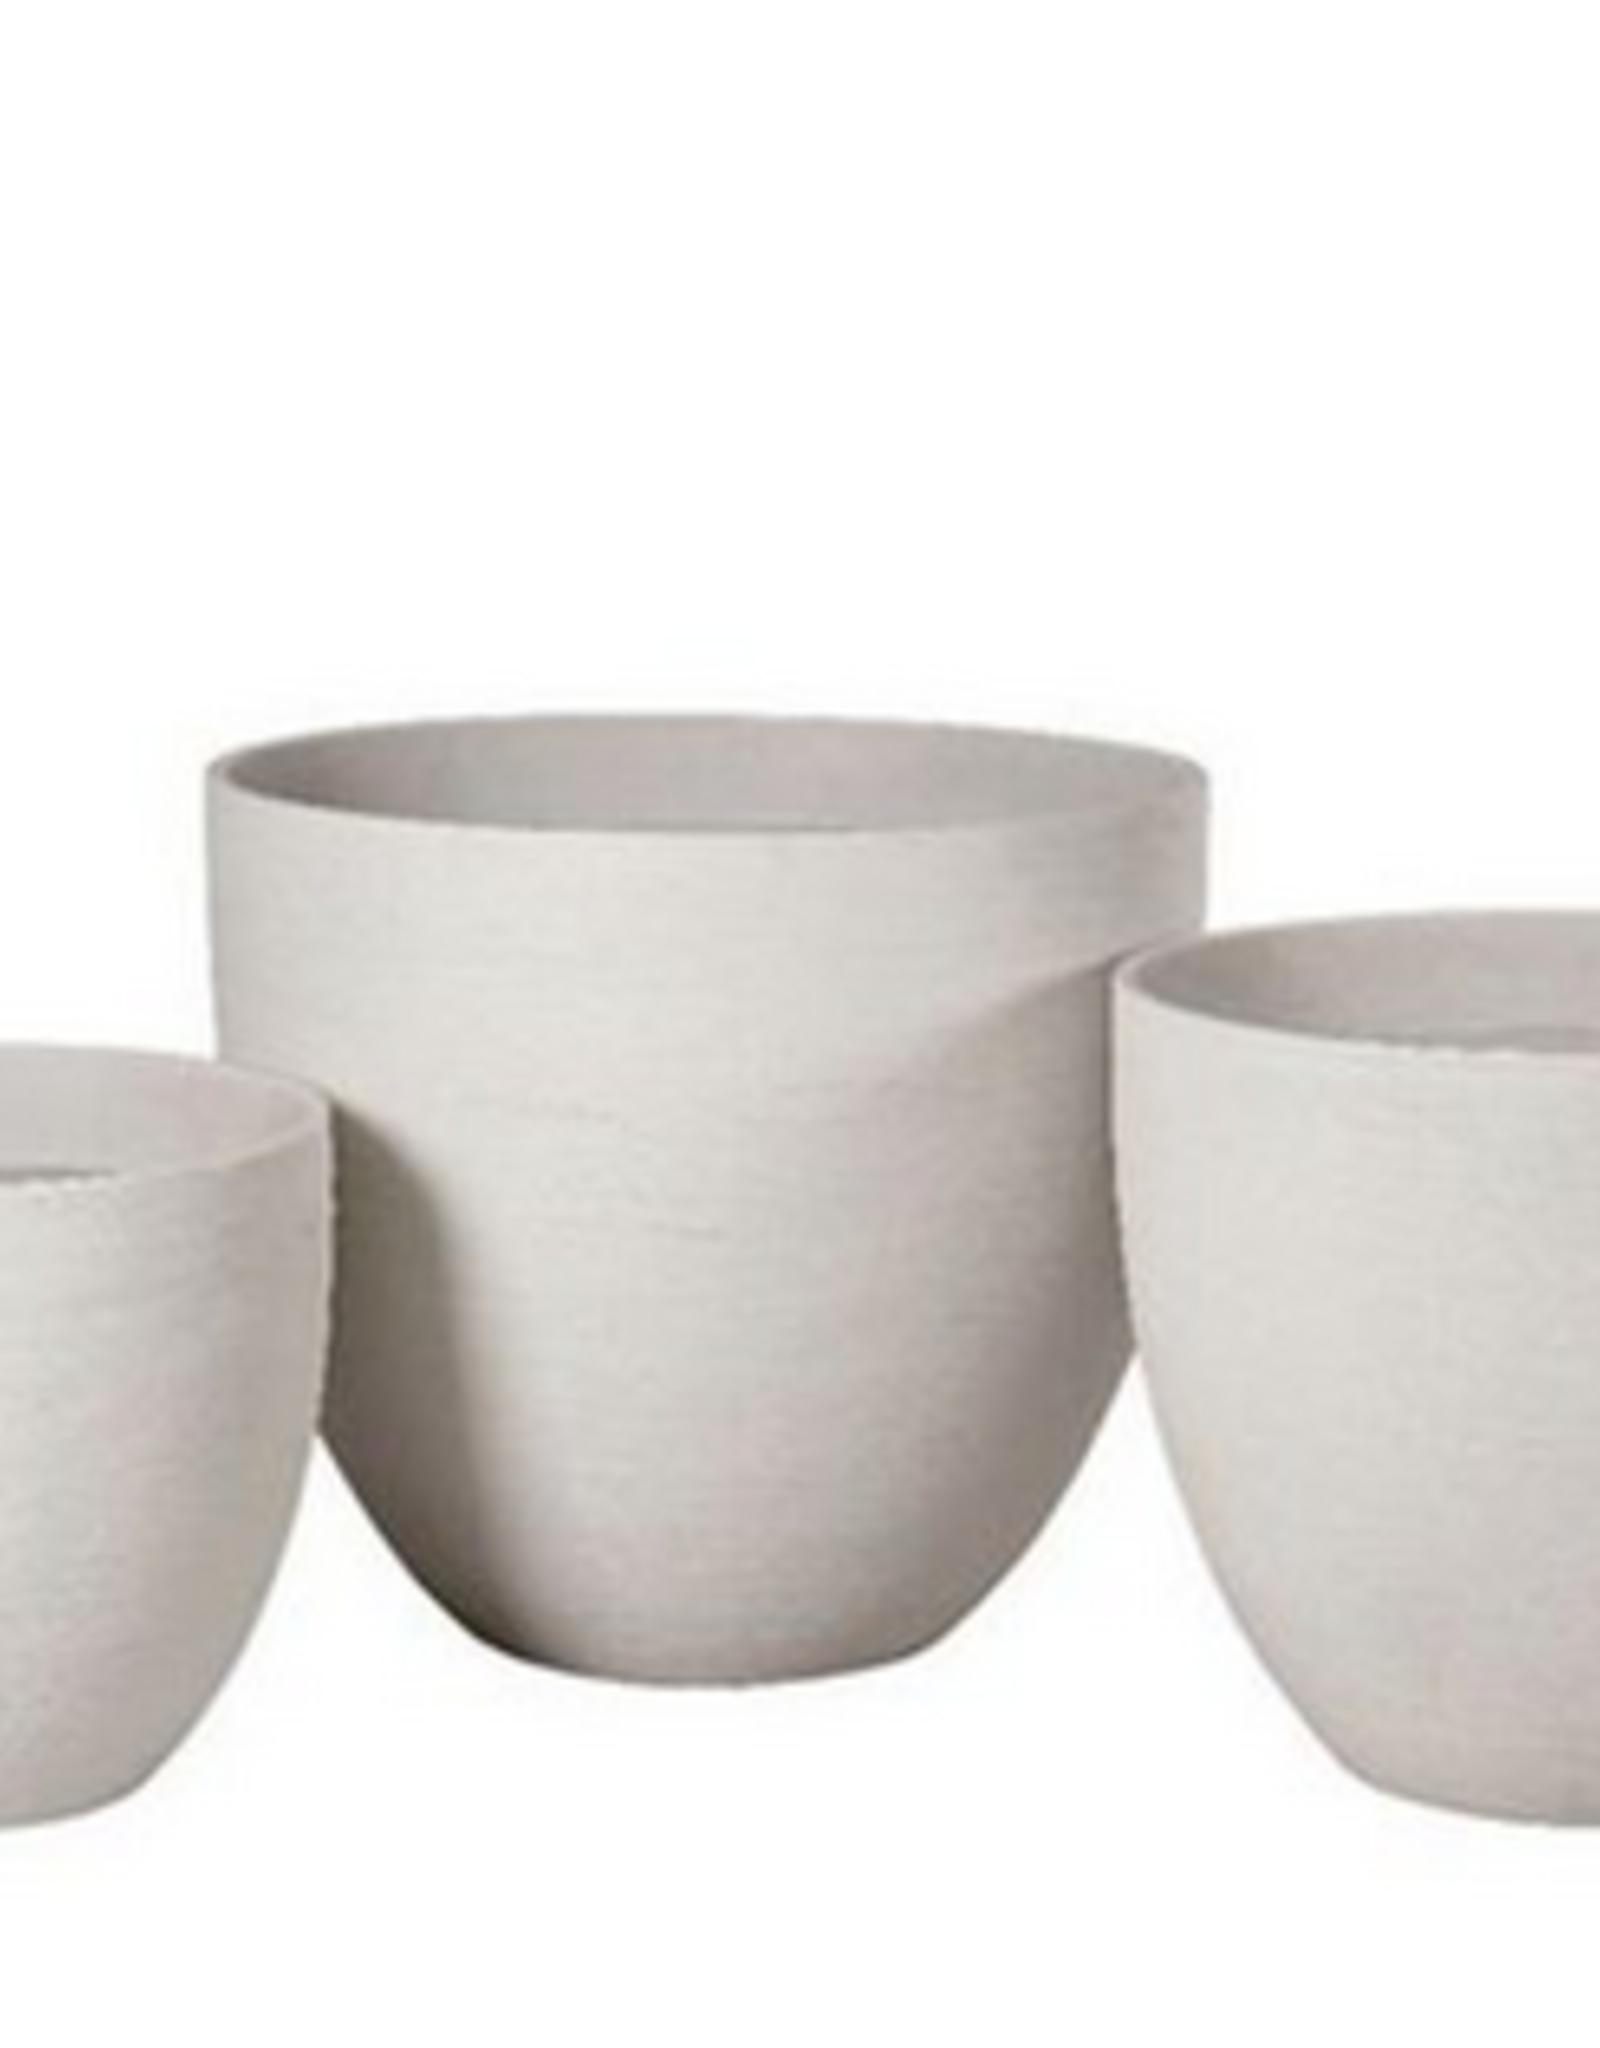 "Medium White Horizontal Scratch Vase Planter D20""  H17.5"""